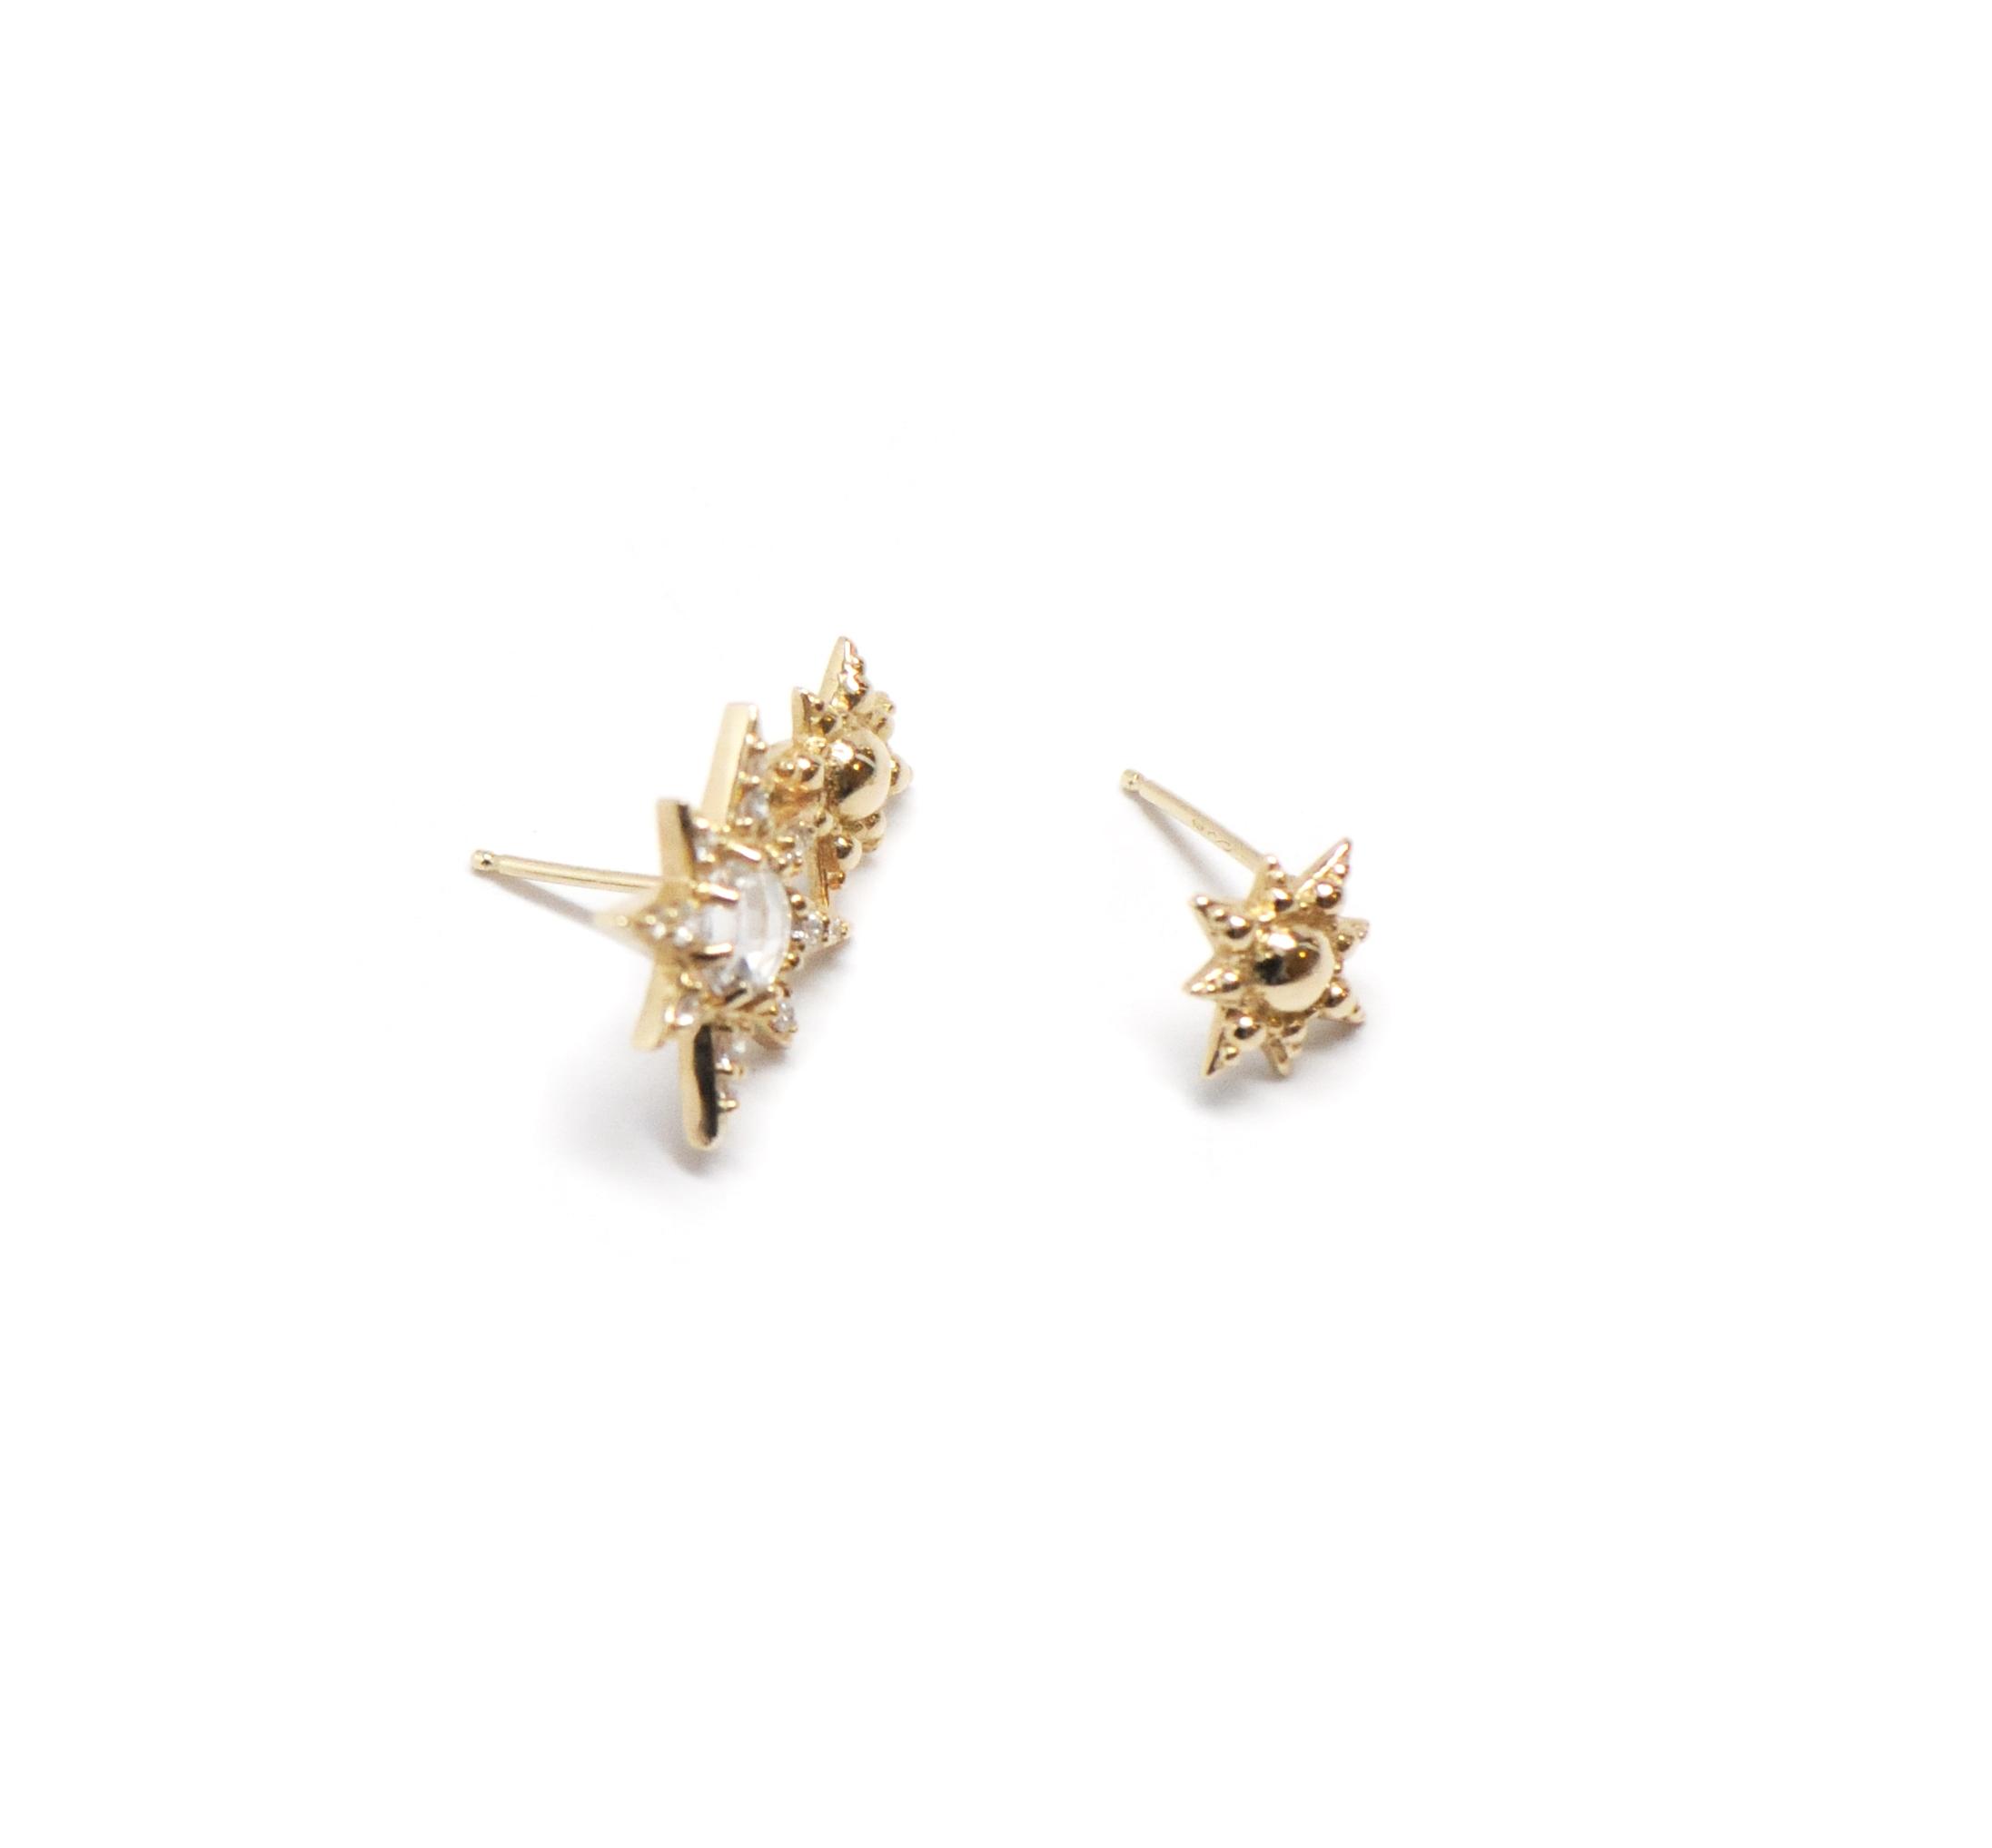 Anzie Aztec Double Starburst Gold Mini Stud Earrings